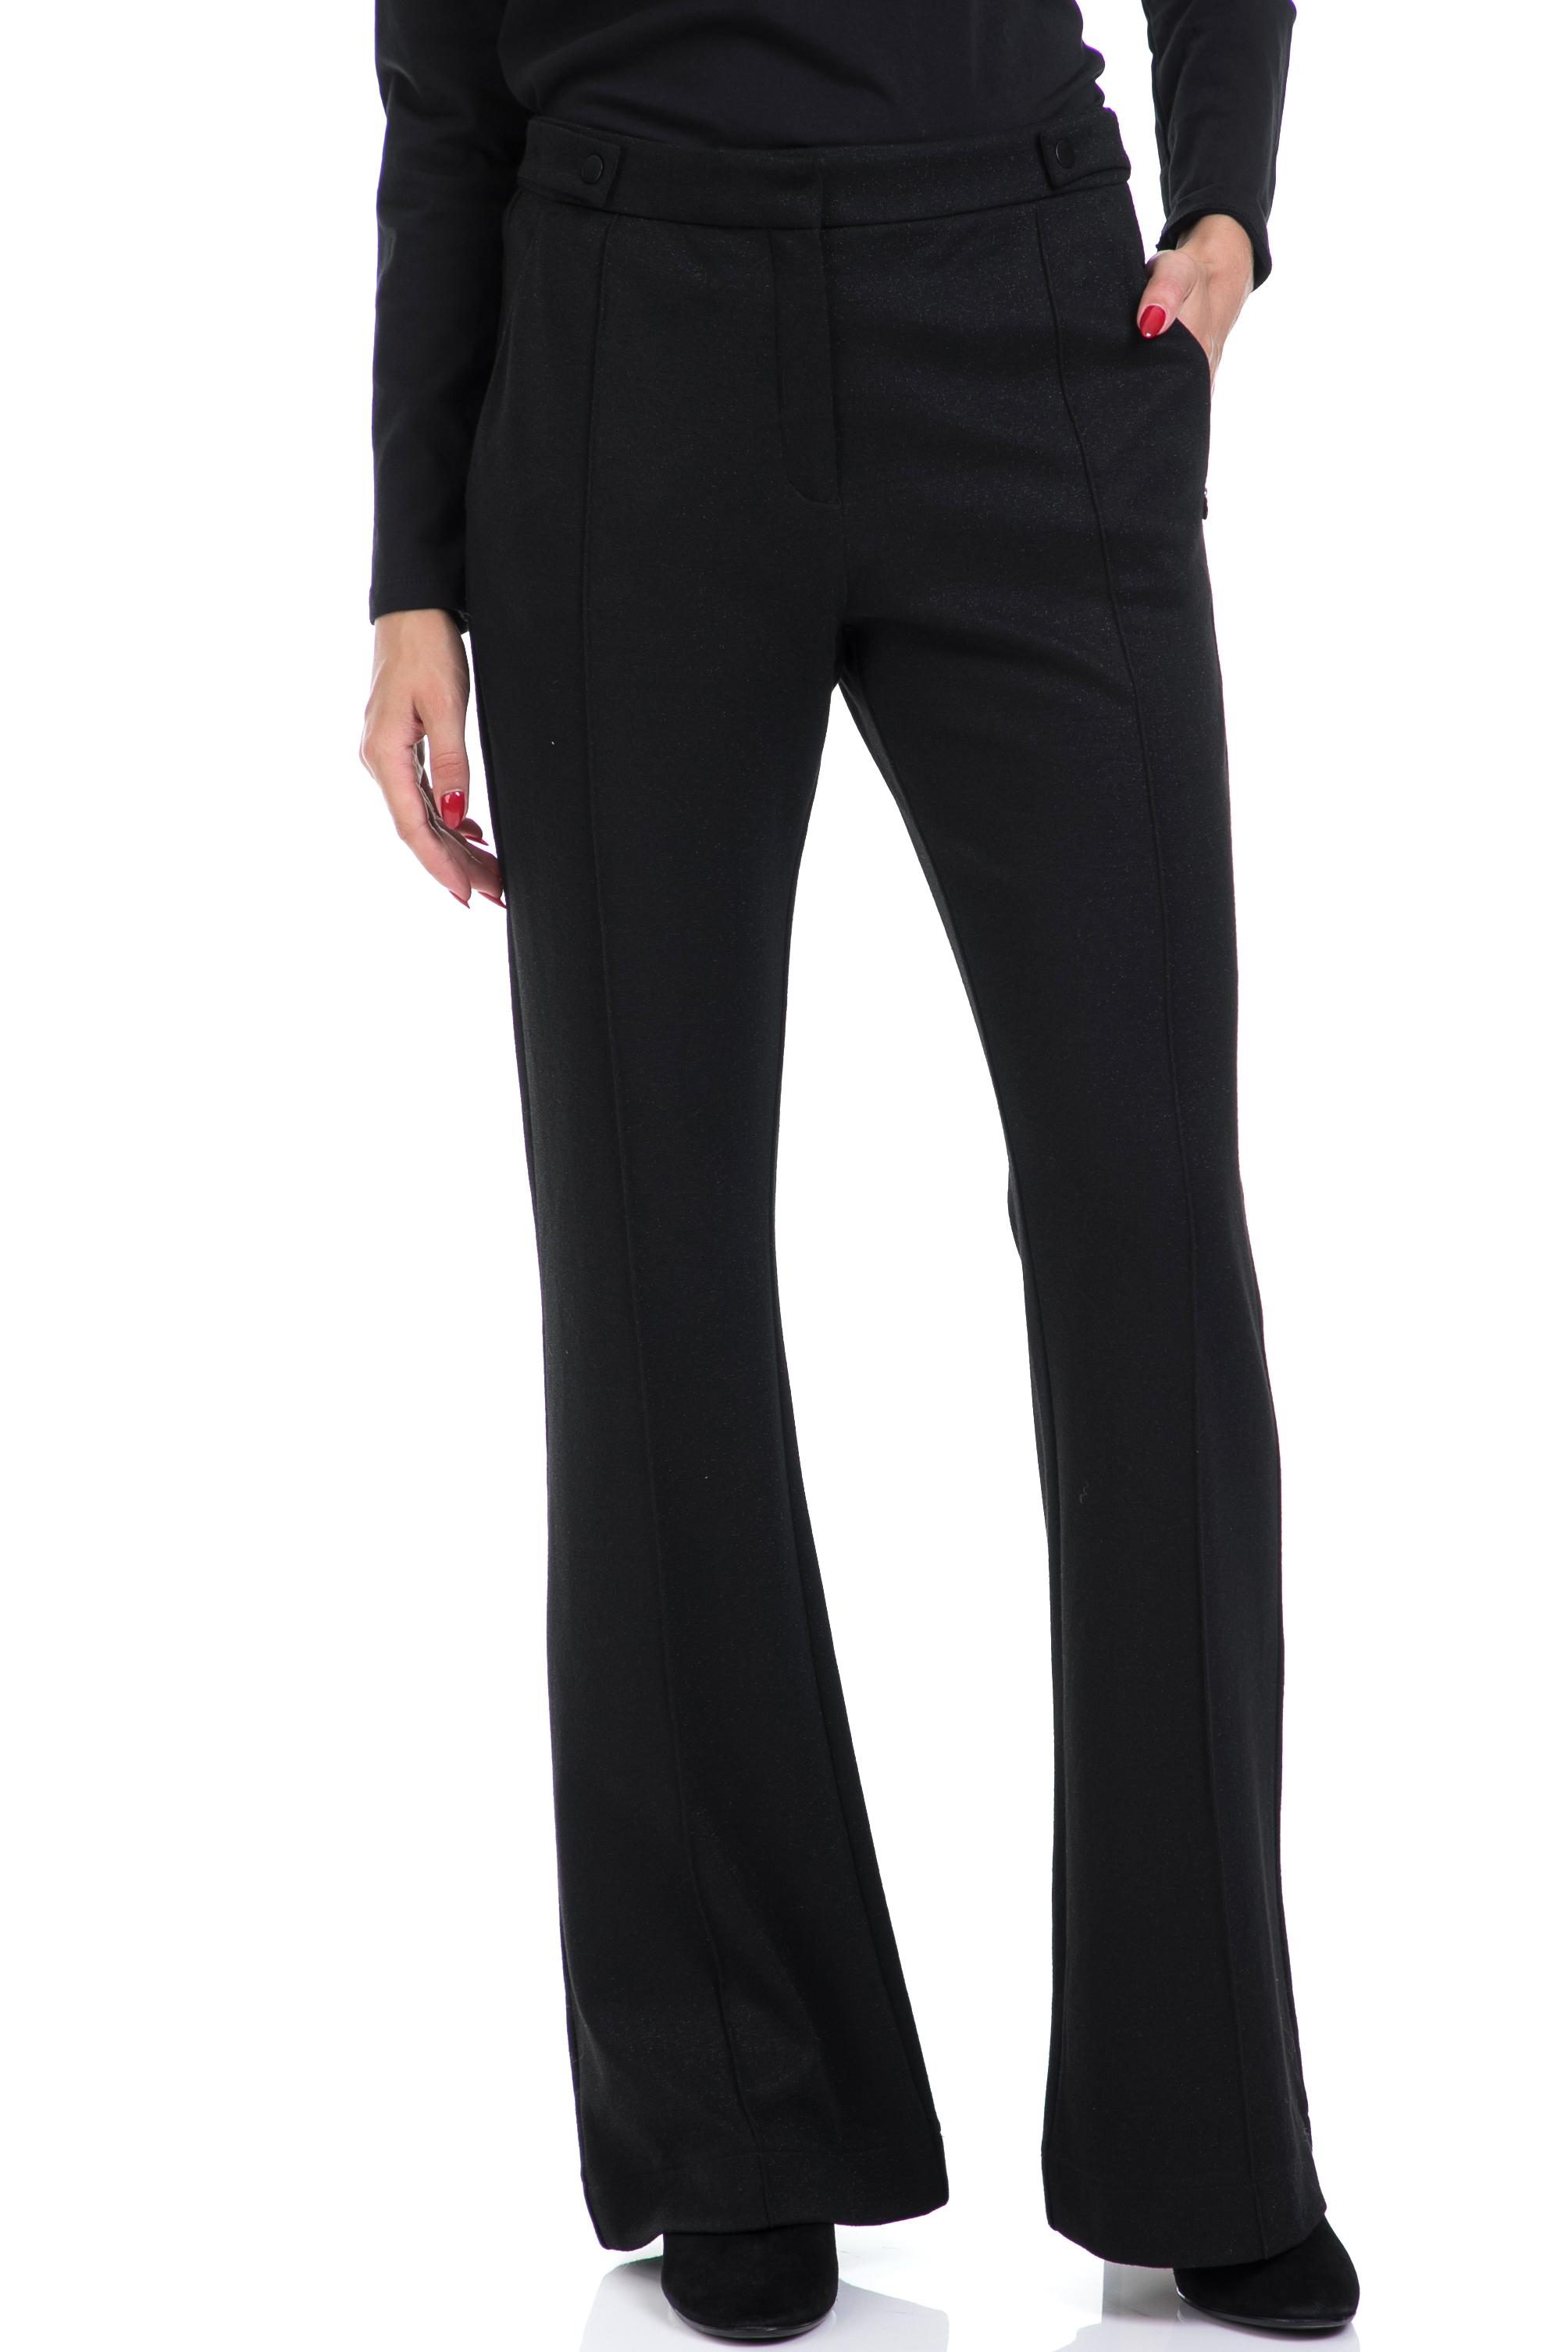 SCOTCH & SODA - Γυναικείο παντελόνι MAISON SCOTCH μαύρο γυναικεία ρούχα παντελόνια